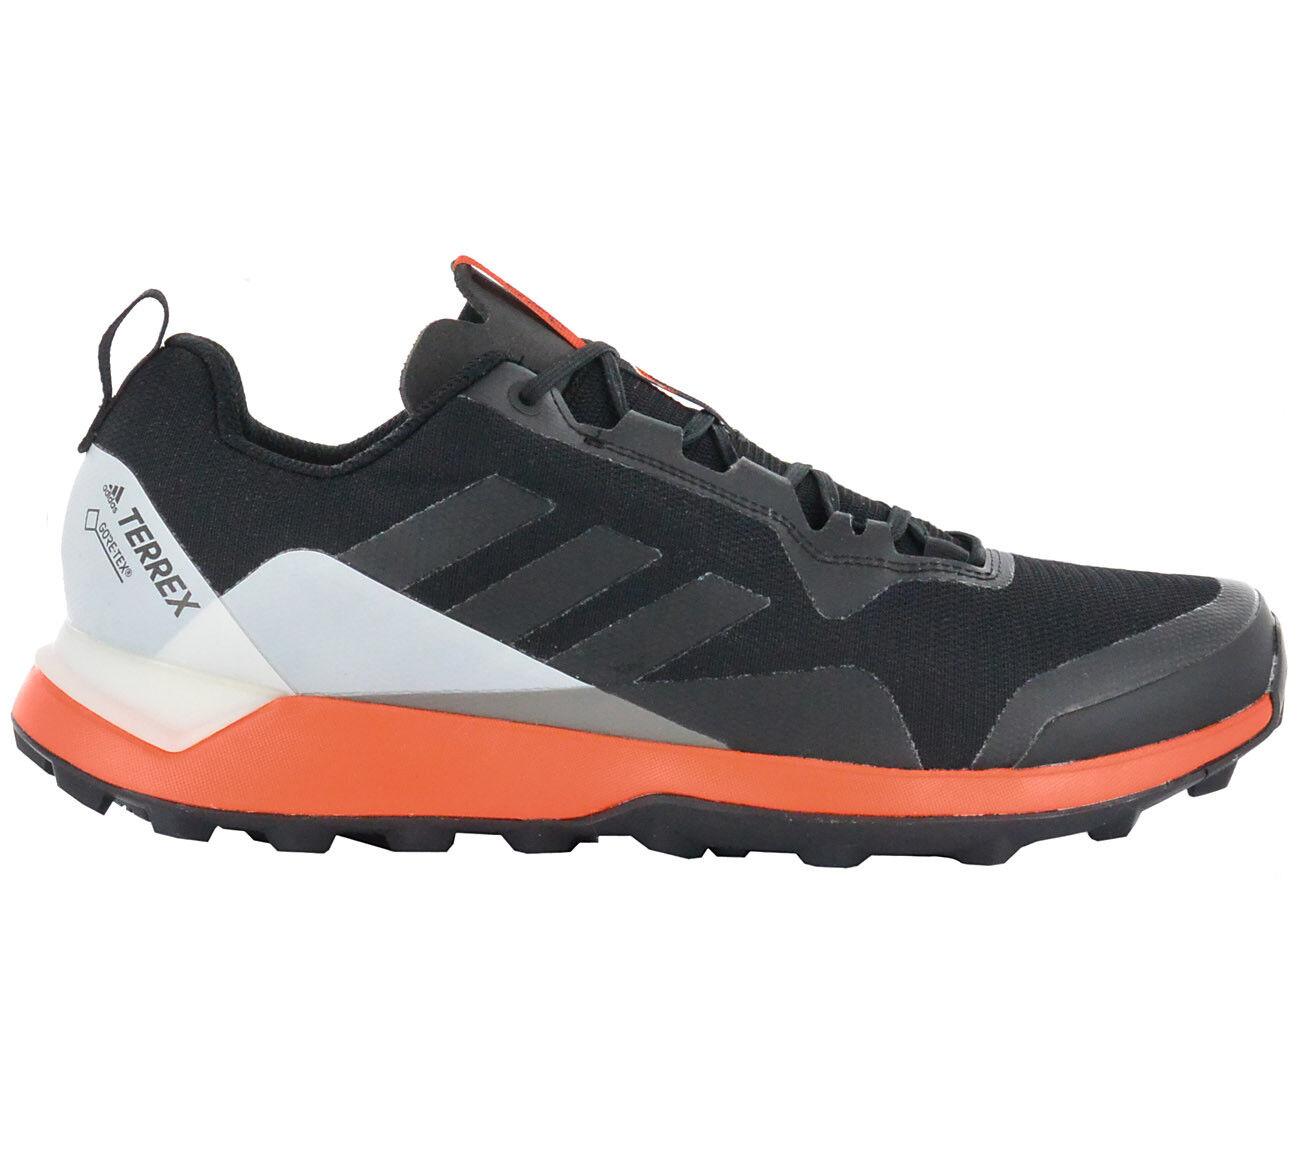 Adidas Terrex Terrex Terrex CMTK GTX Gore-Tex Schuhe Schwarz Herren Wanderschuhe Trail BY2769 90b11e